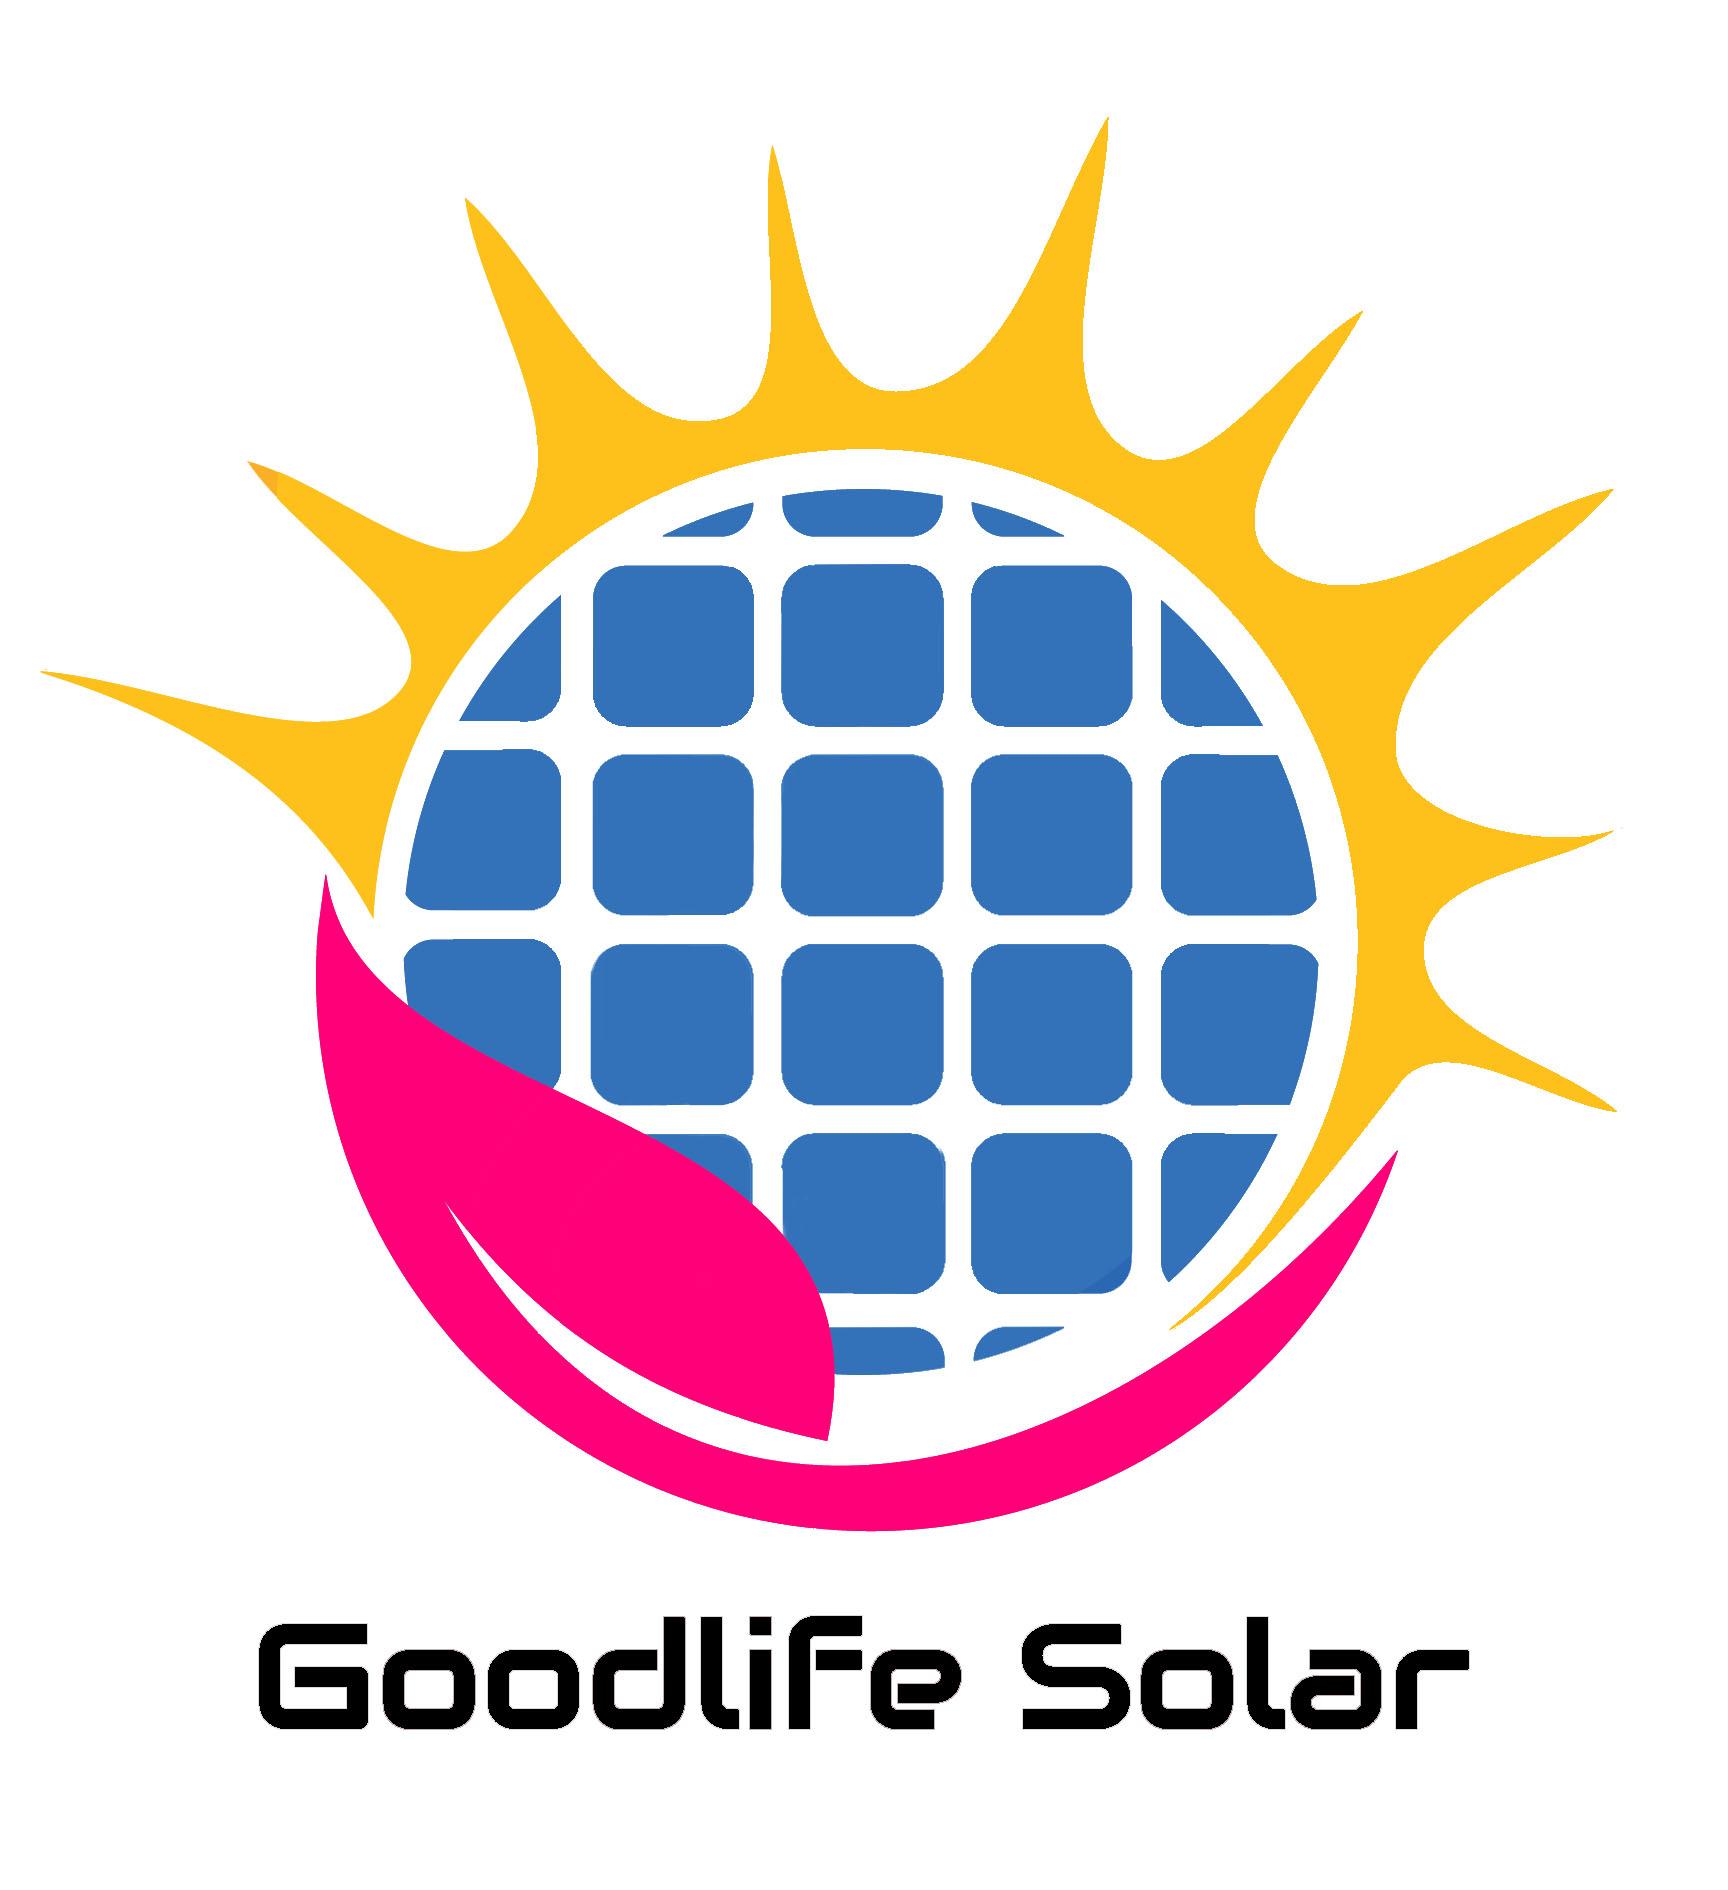 Goodlife Solar